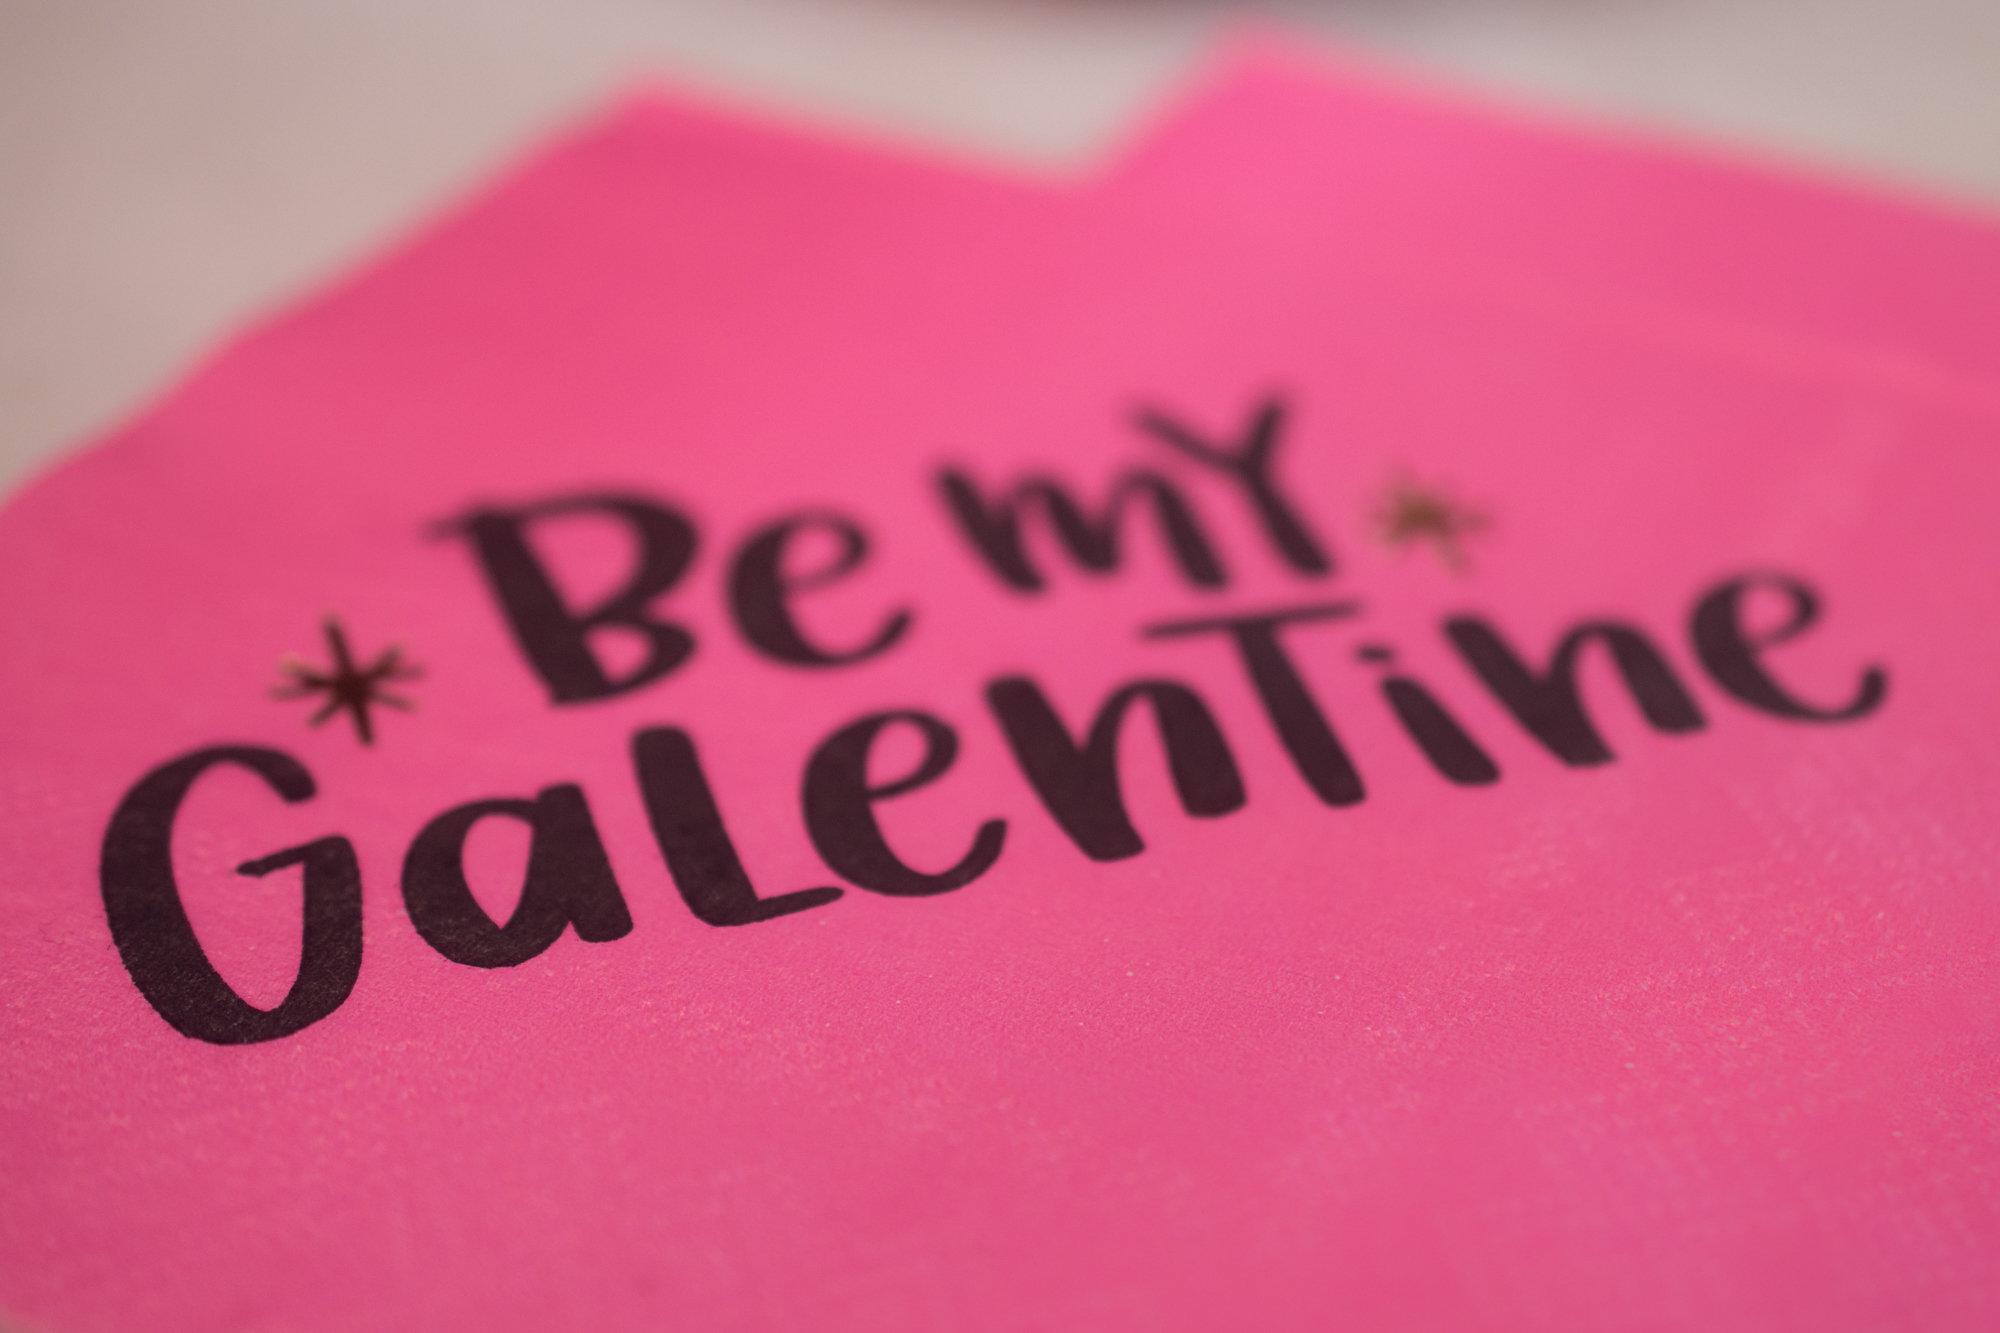 be-my-galentine.jpg